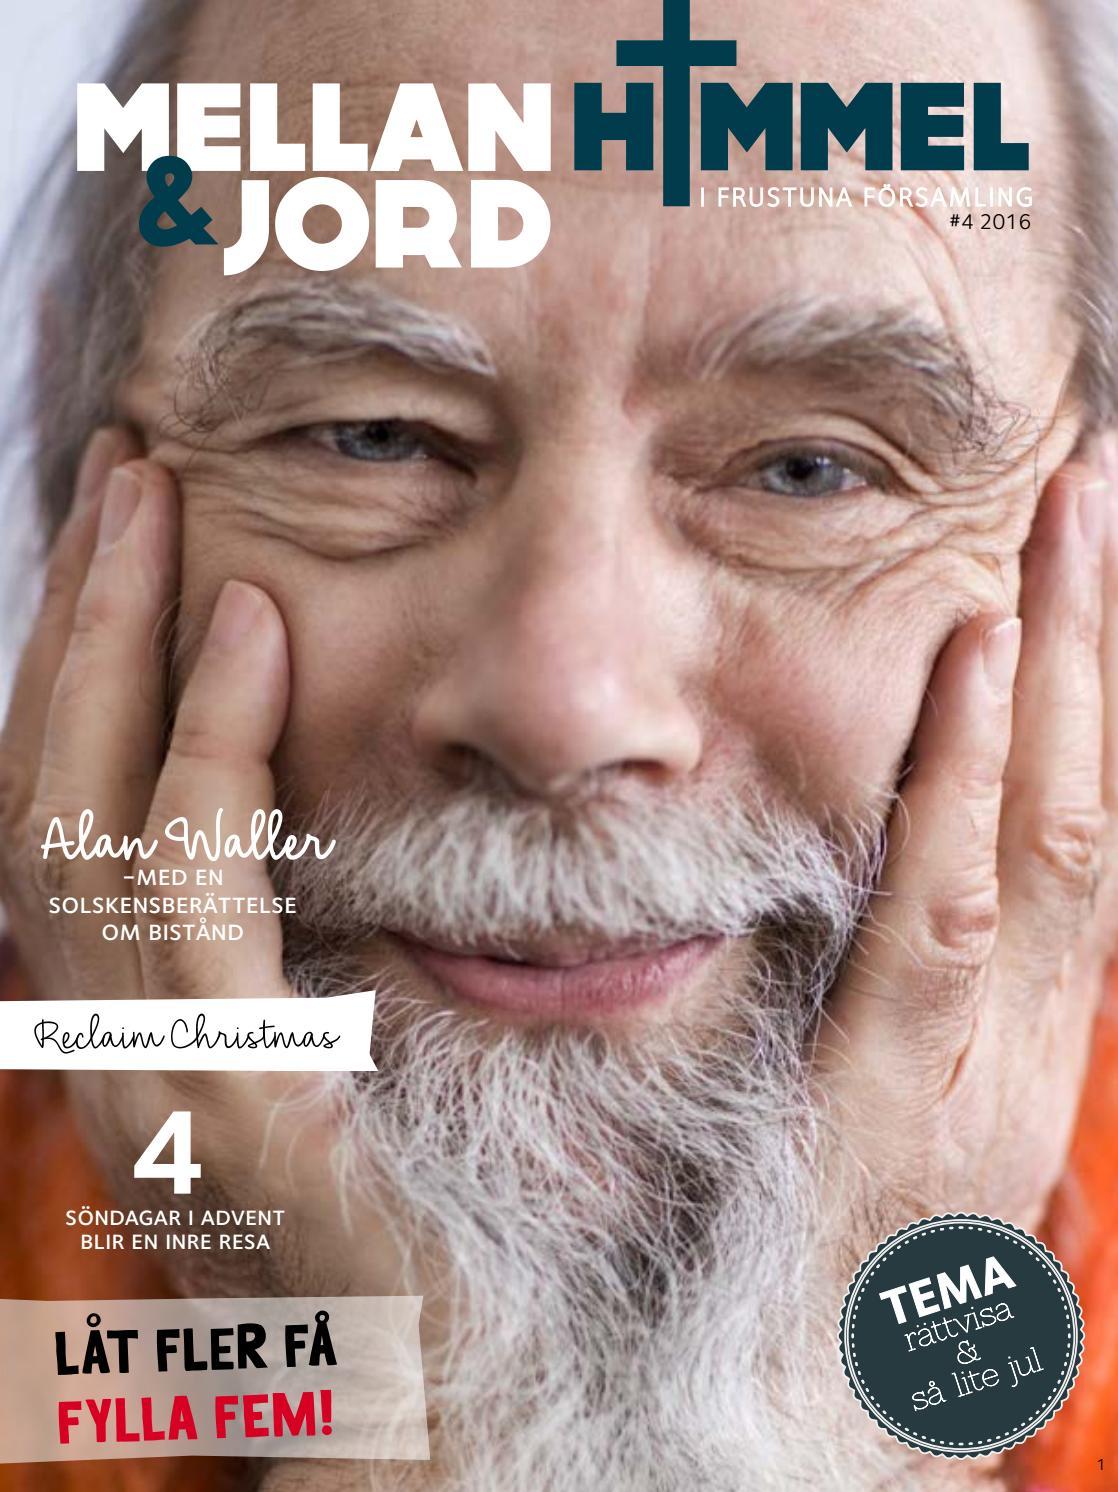 Mellan Himmel & Jord #2 - 2019 by Frustuna frsamling - issuu